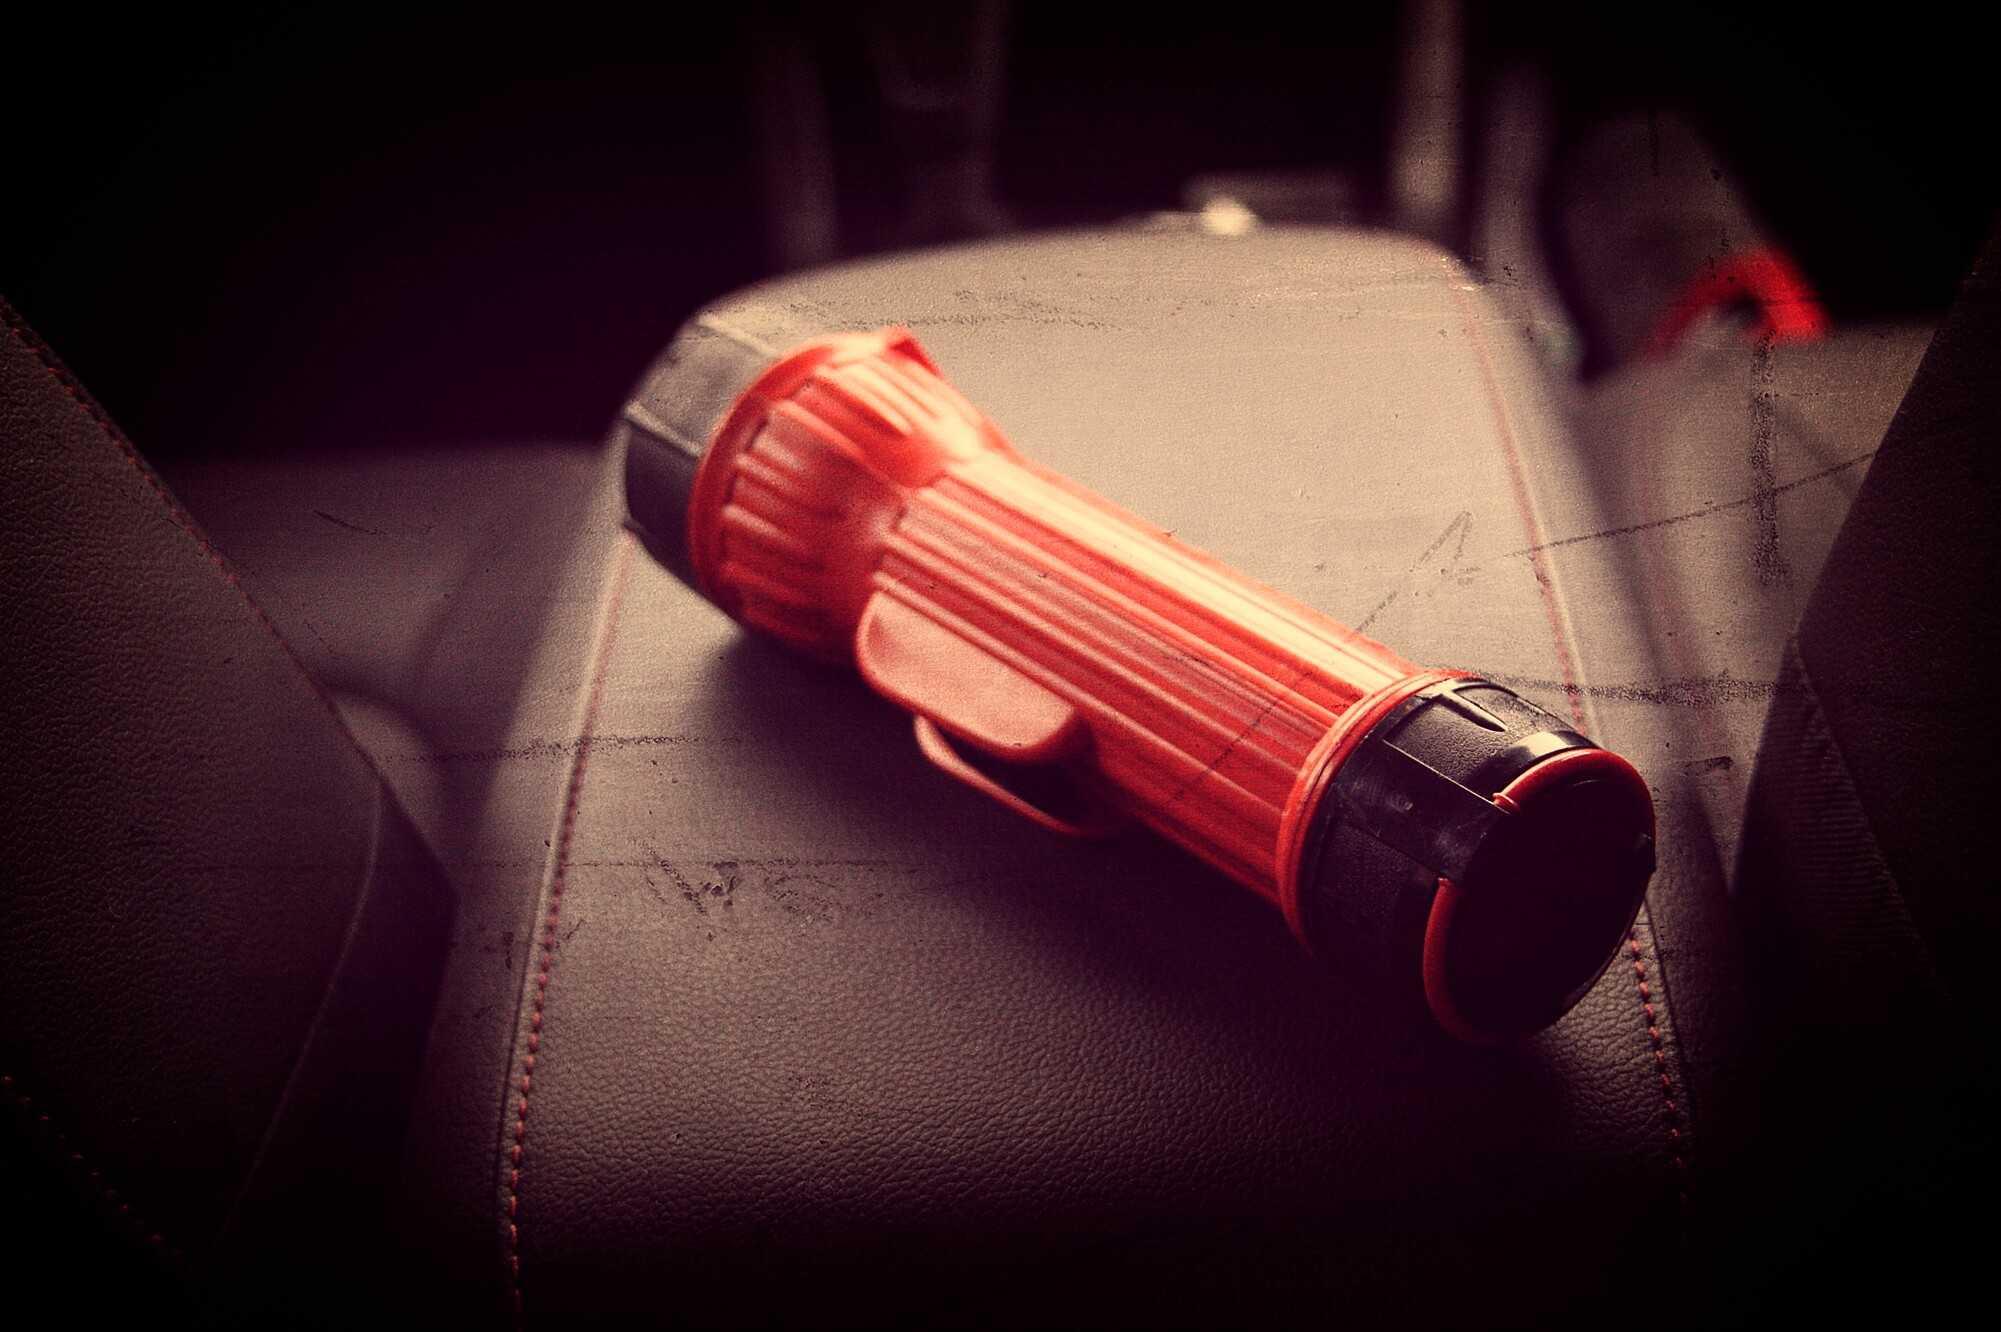 Keep a flashLight in the car